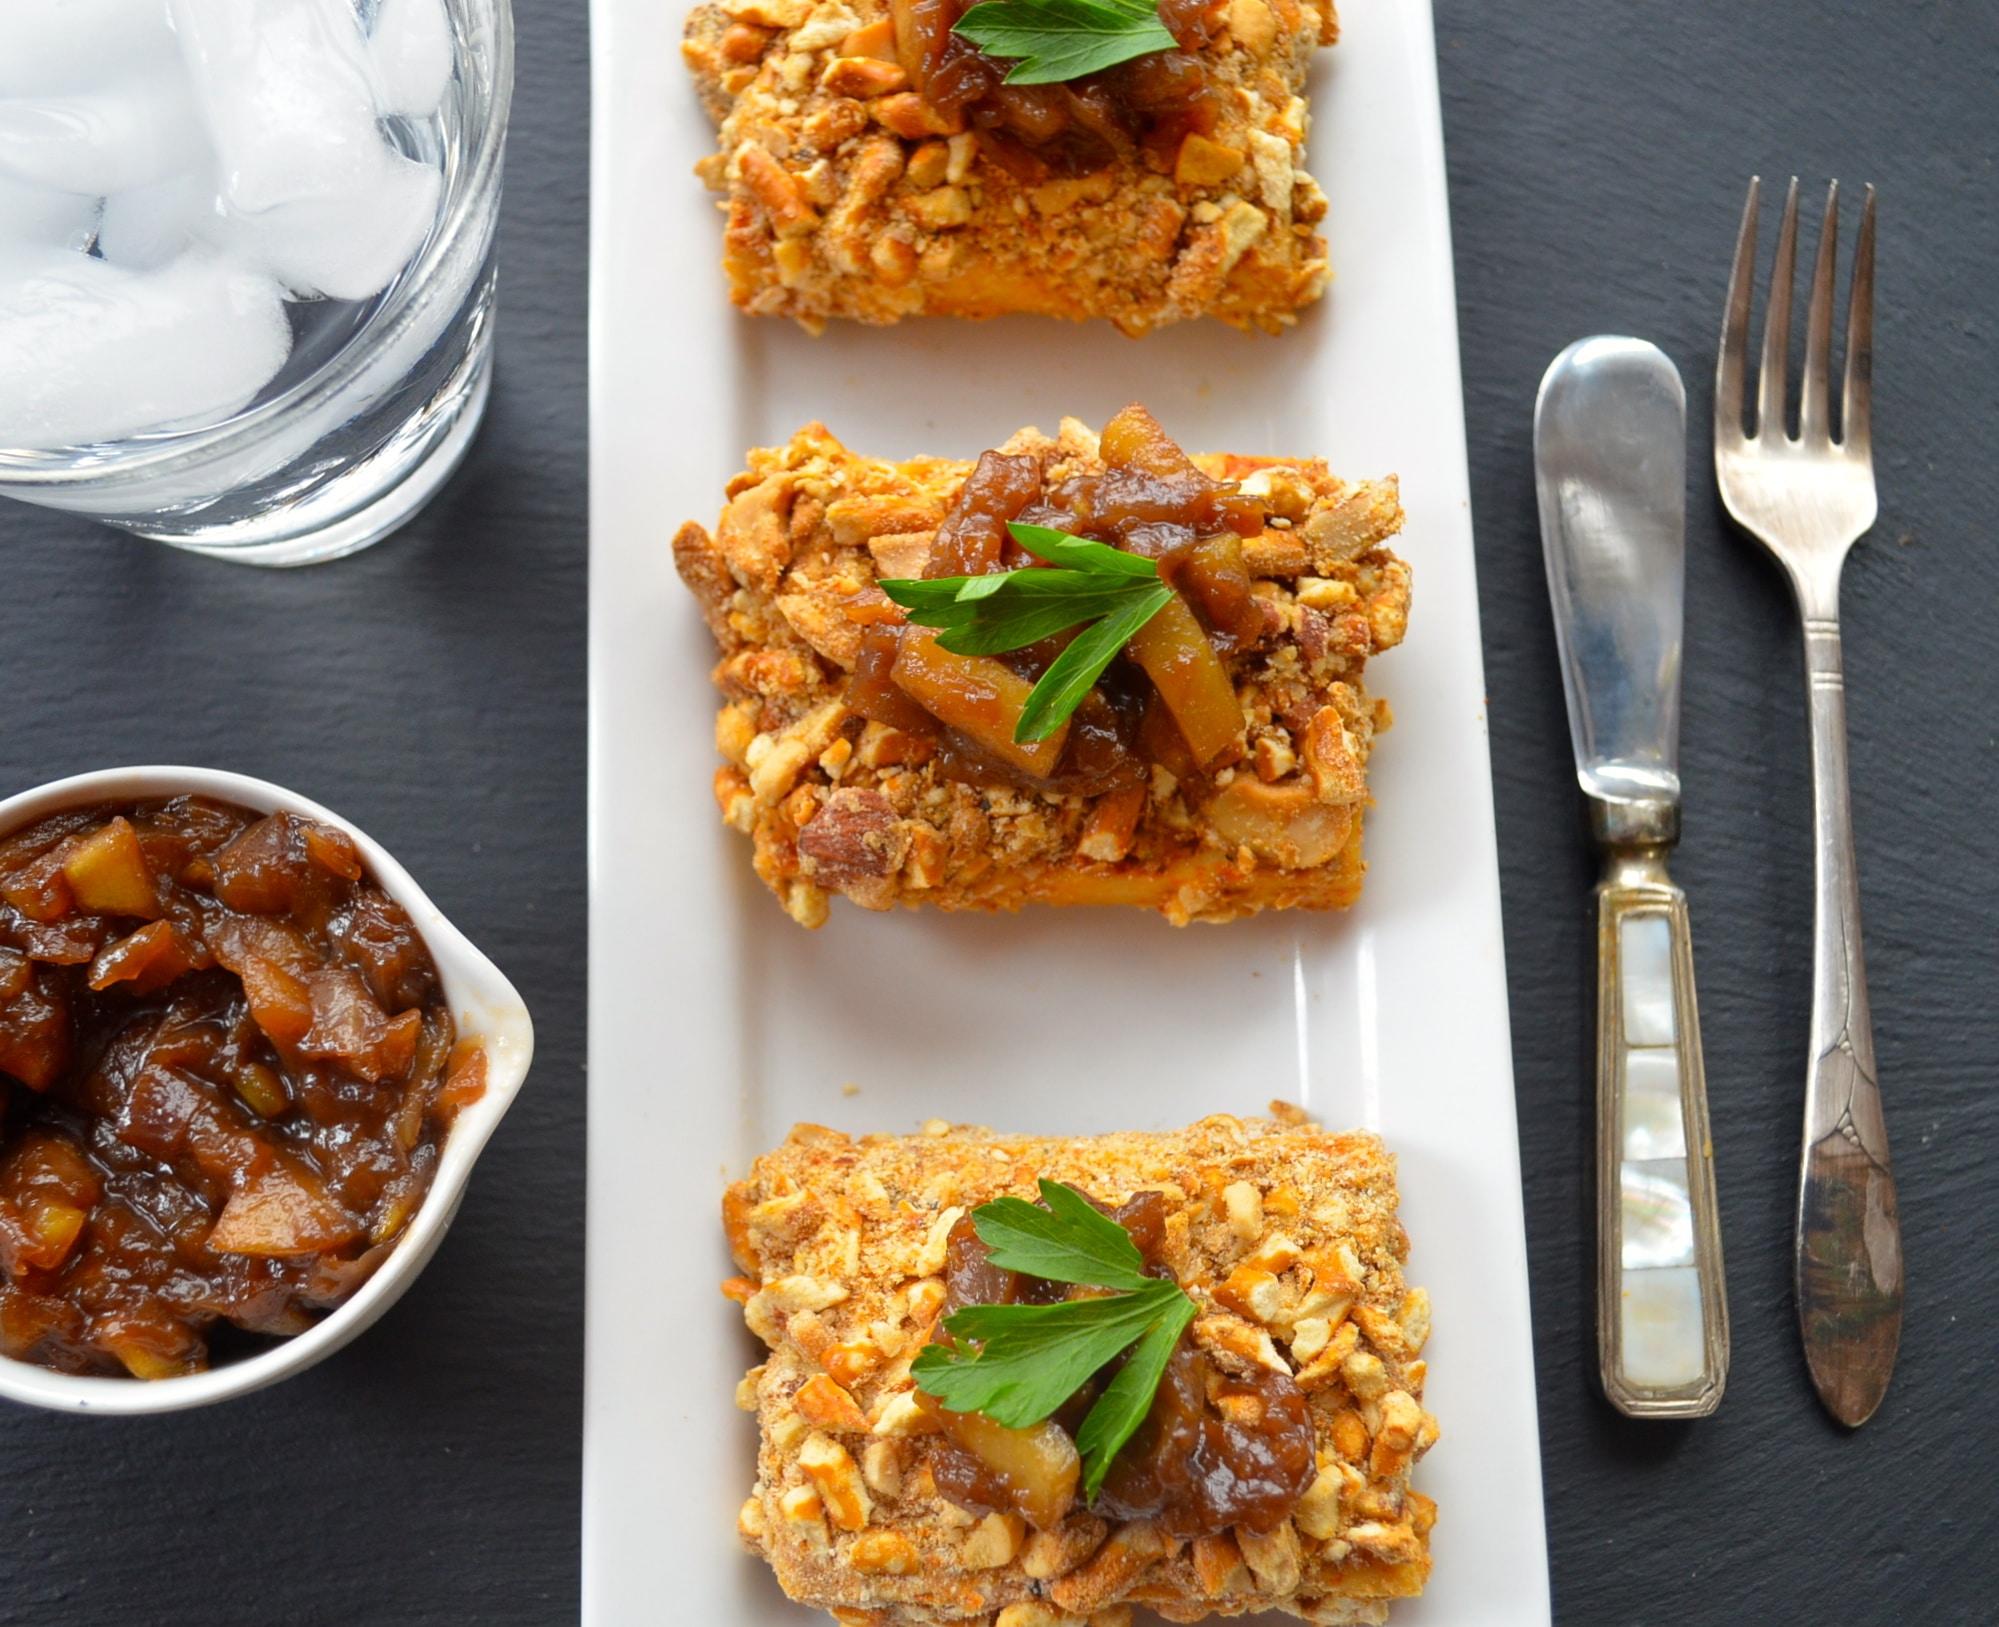 pretzel & cashew crusted tofu #Cashews #tofu #pretzel #Vegetarian #thanksgiving #vegan #kosher #parve #chutney #main #entree